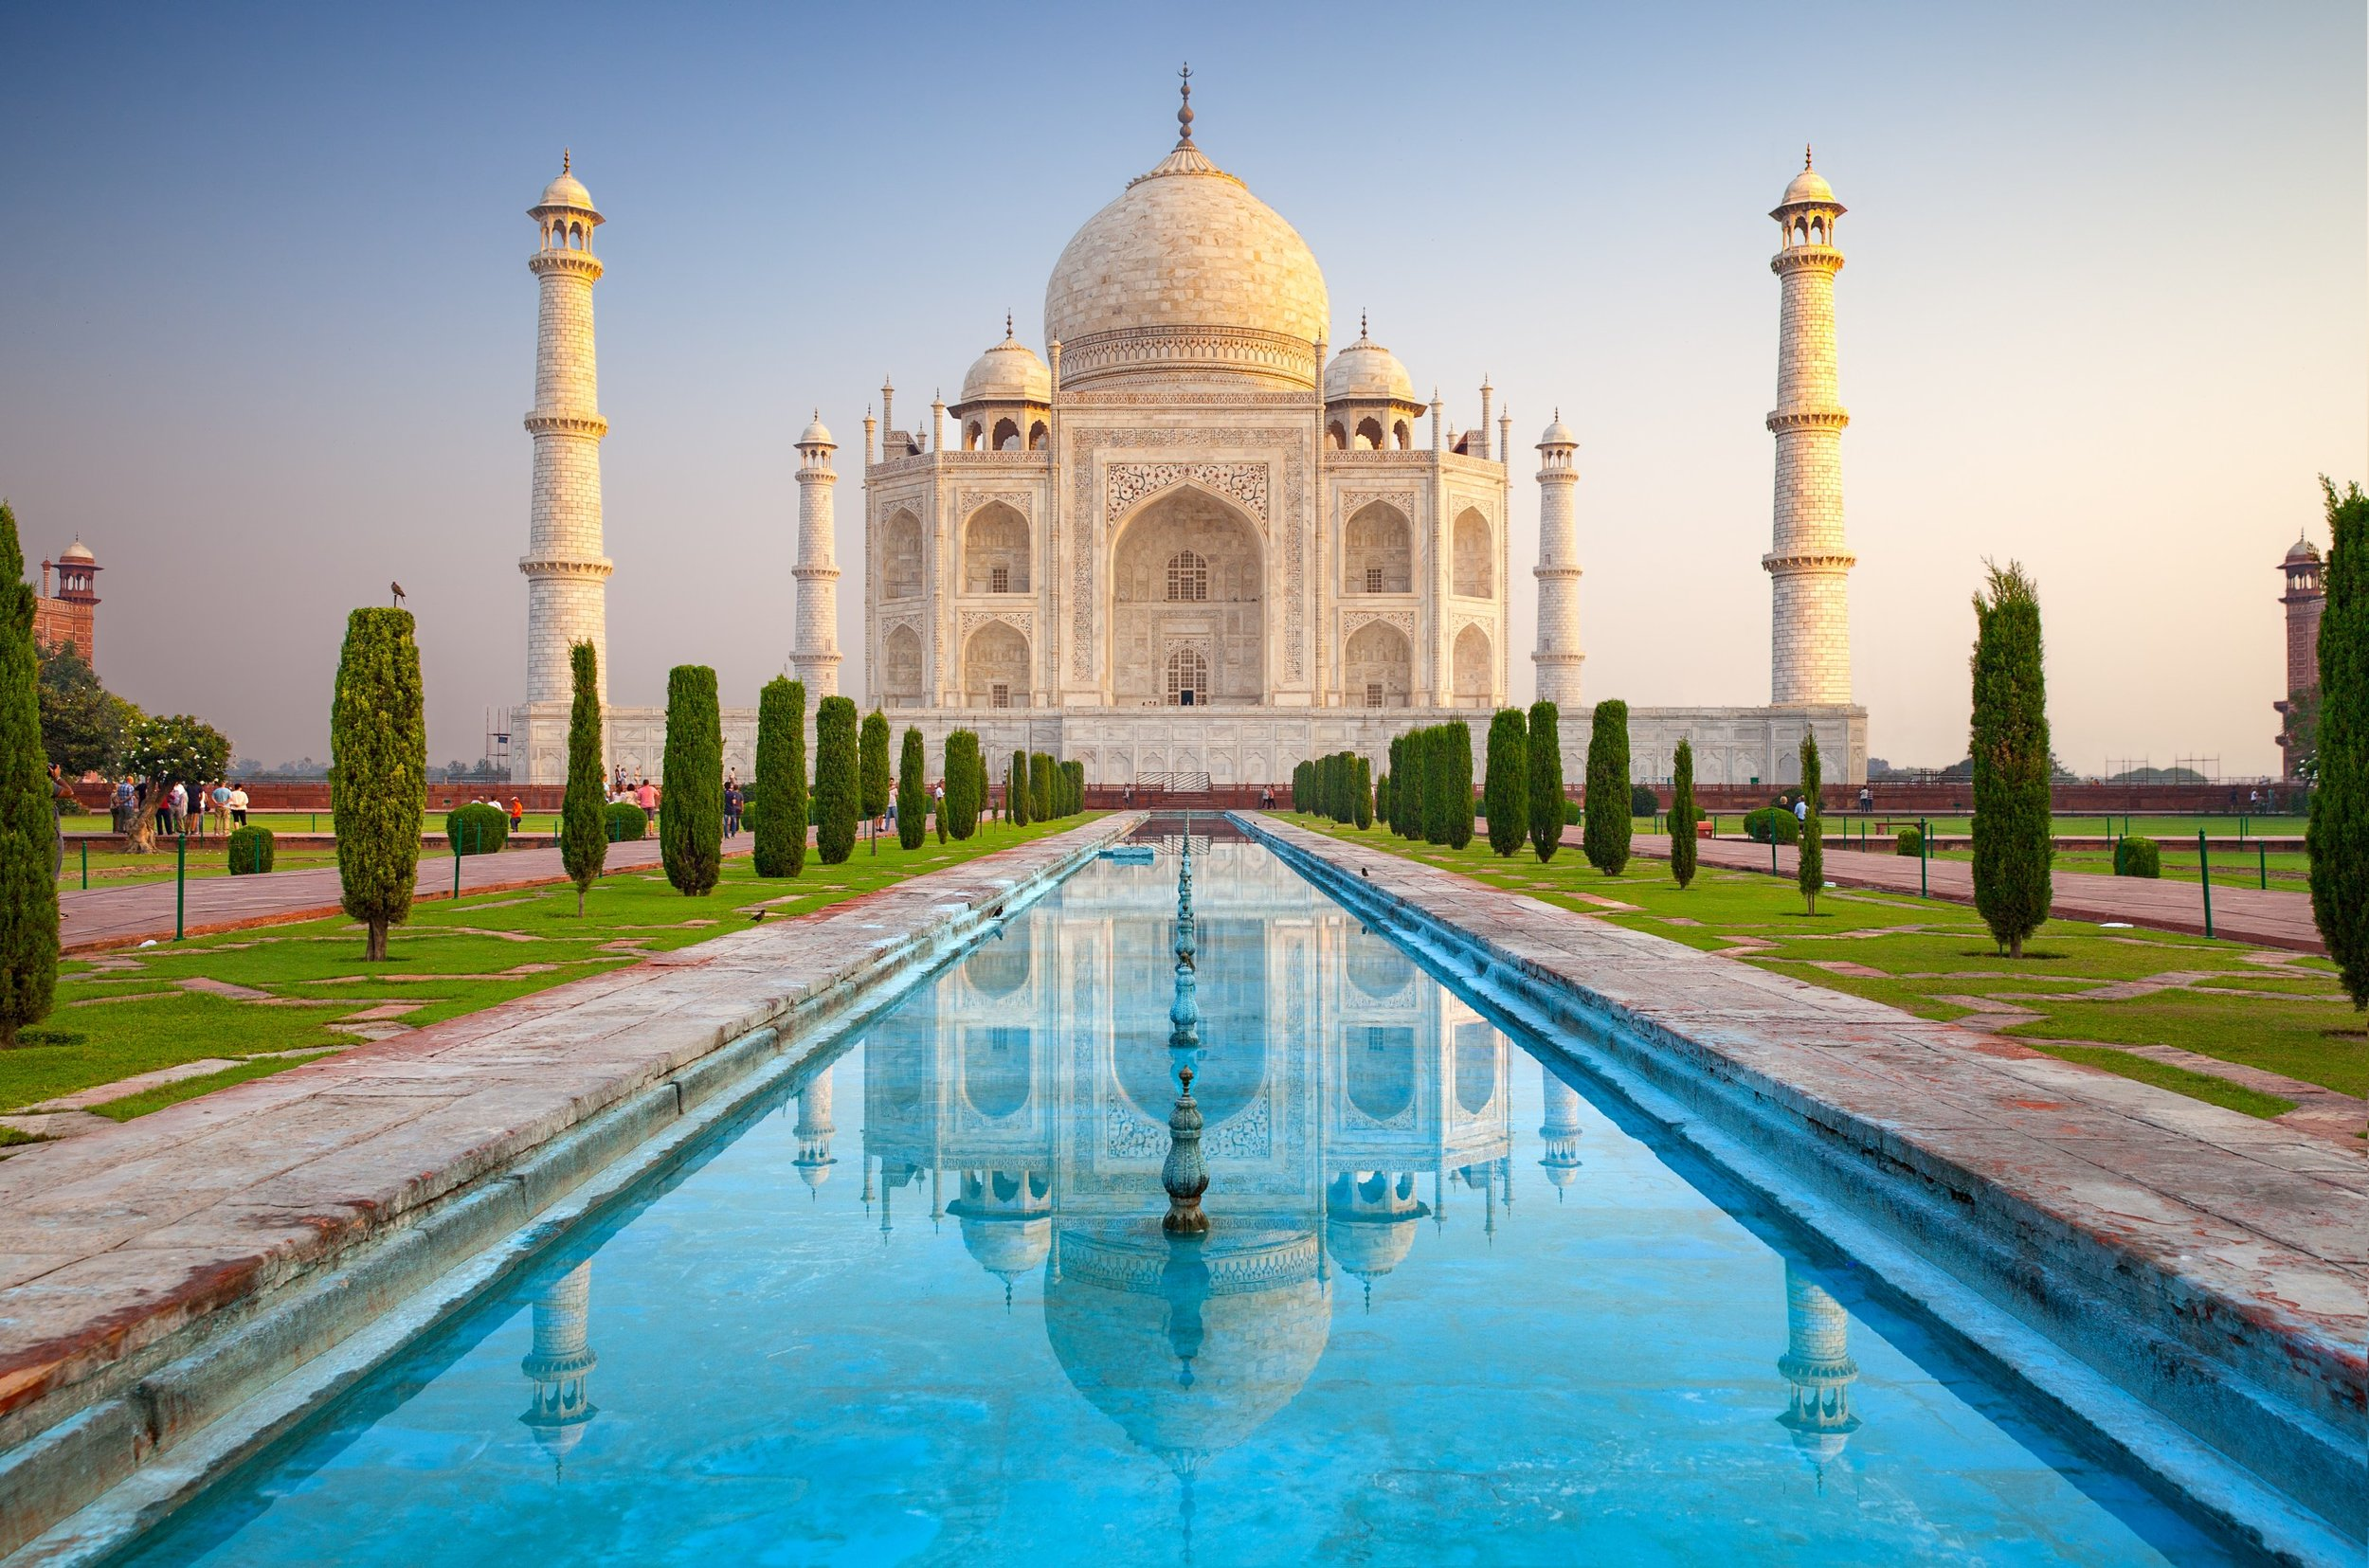 india-148045726738o.jpg